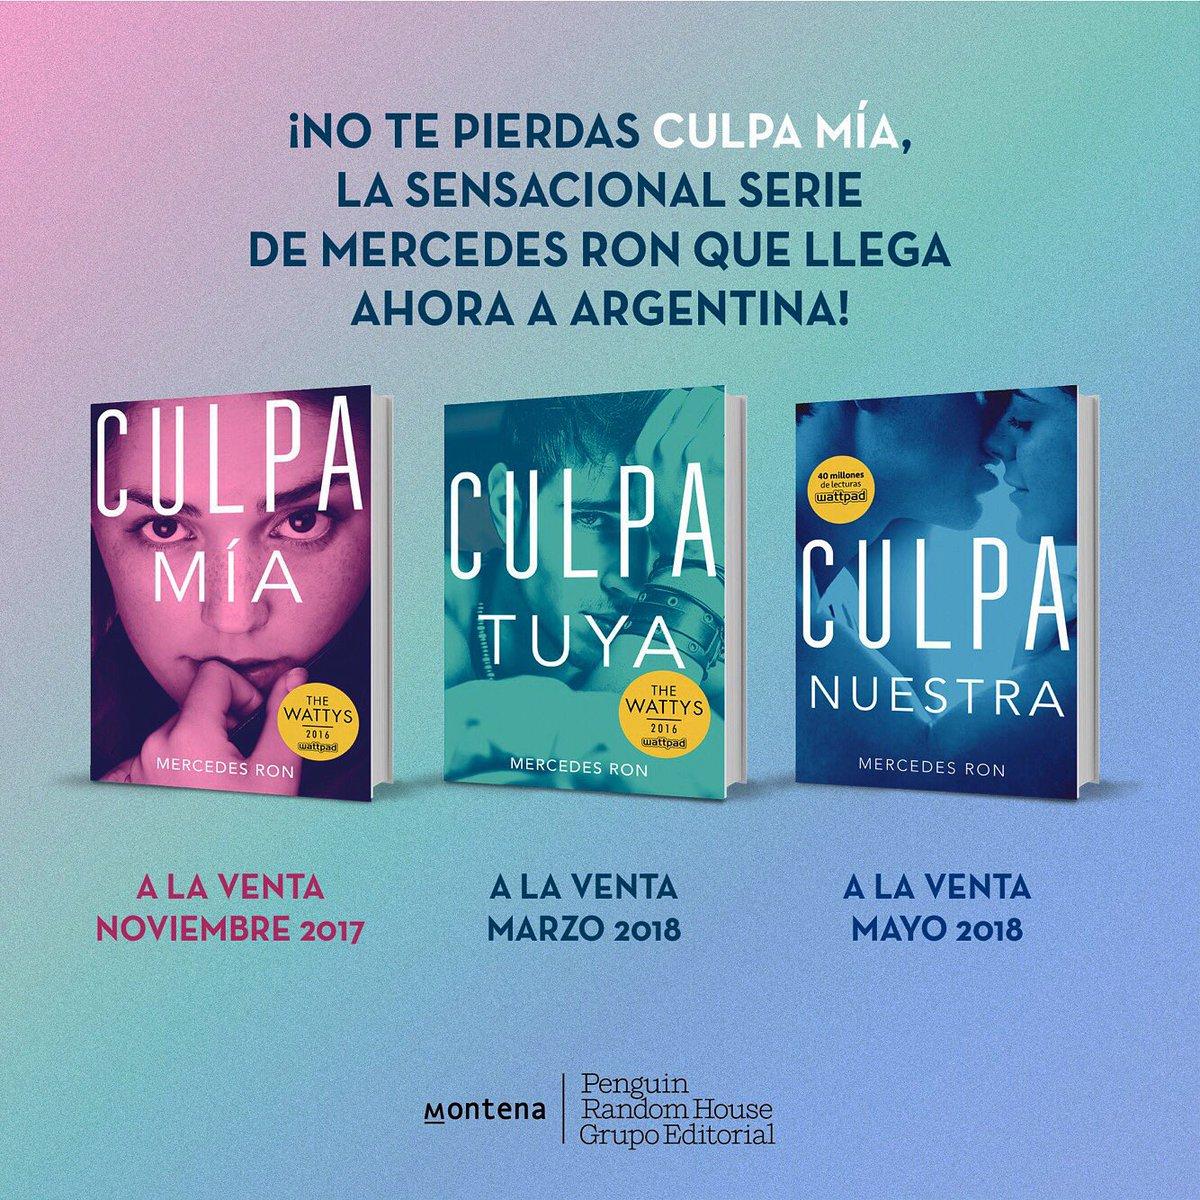 Mercedes Ron Twitterissä Culpa Mía Llega A Argentina